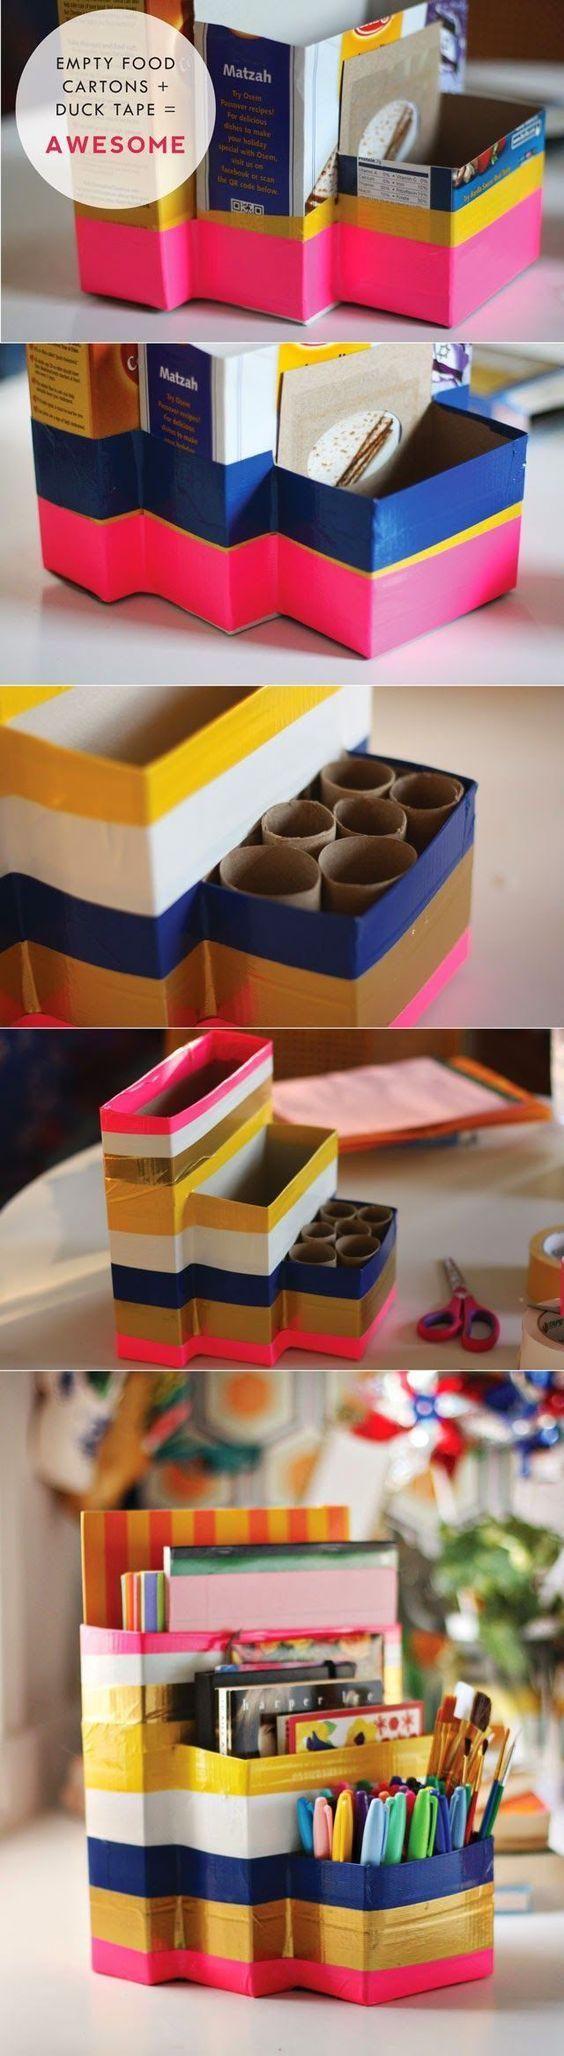 31 Super nützliche DIY Schreibtisch Dekor Ideen folgen 22